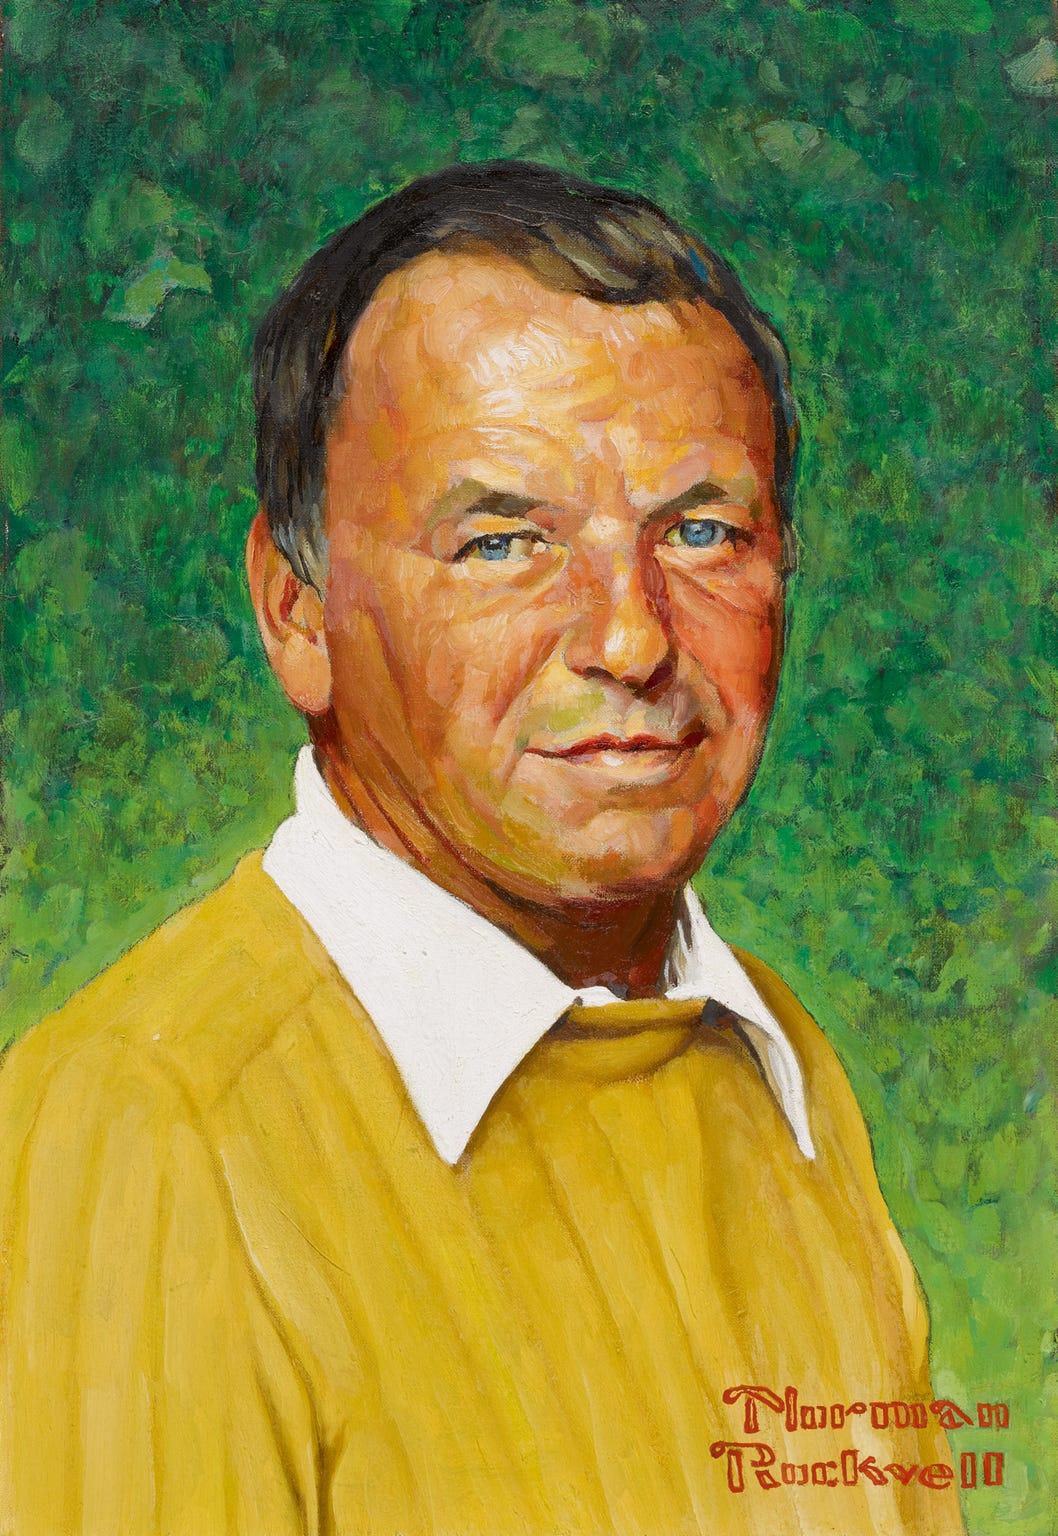 Norman Rockwell's 1973 portrait of Frank Sinatra